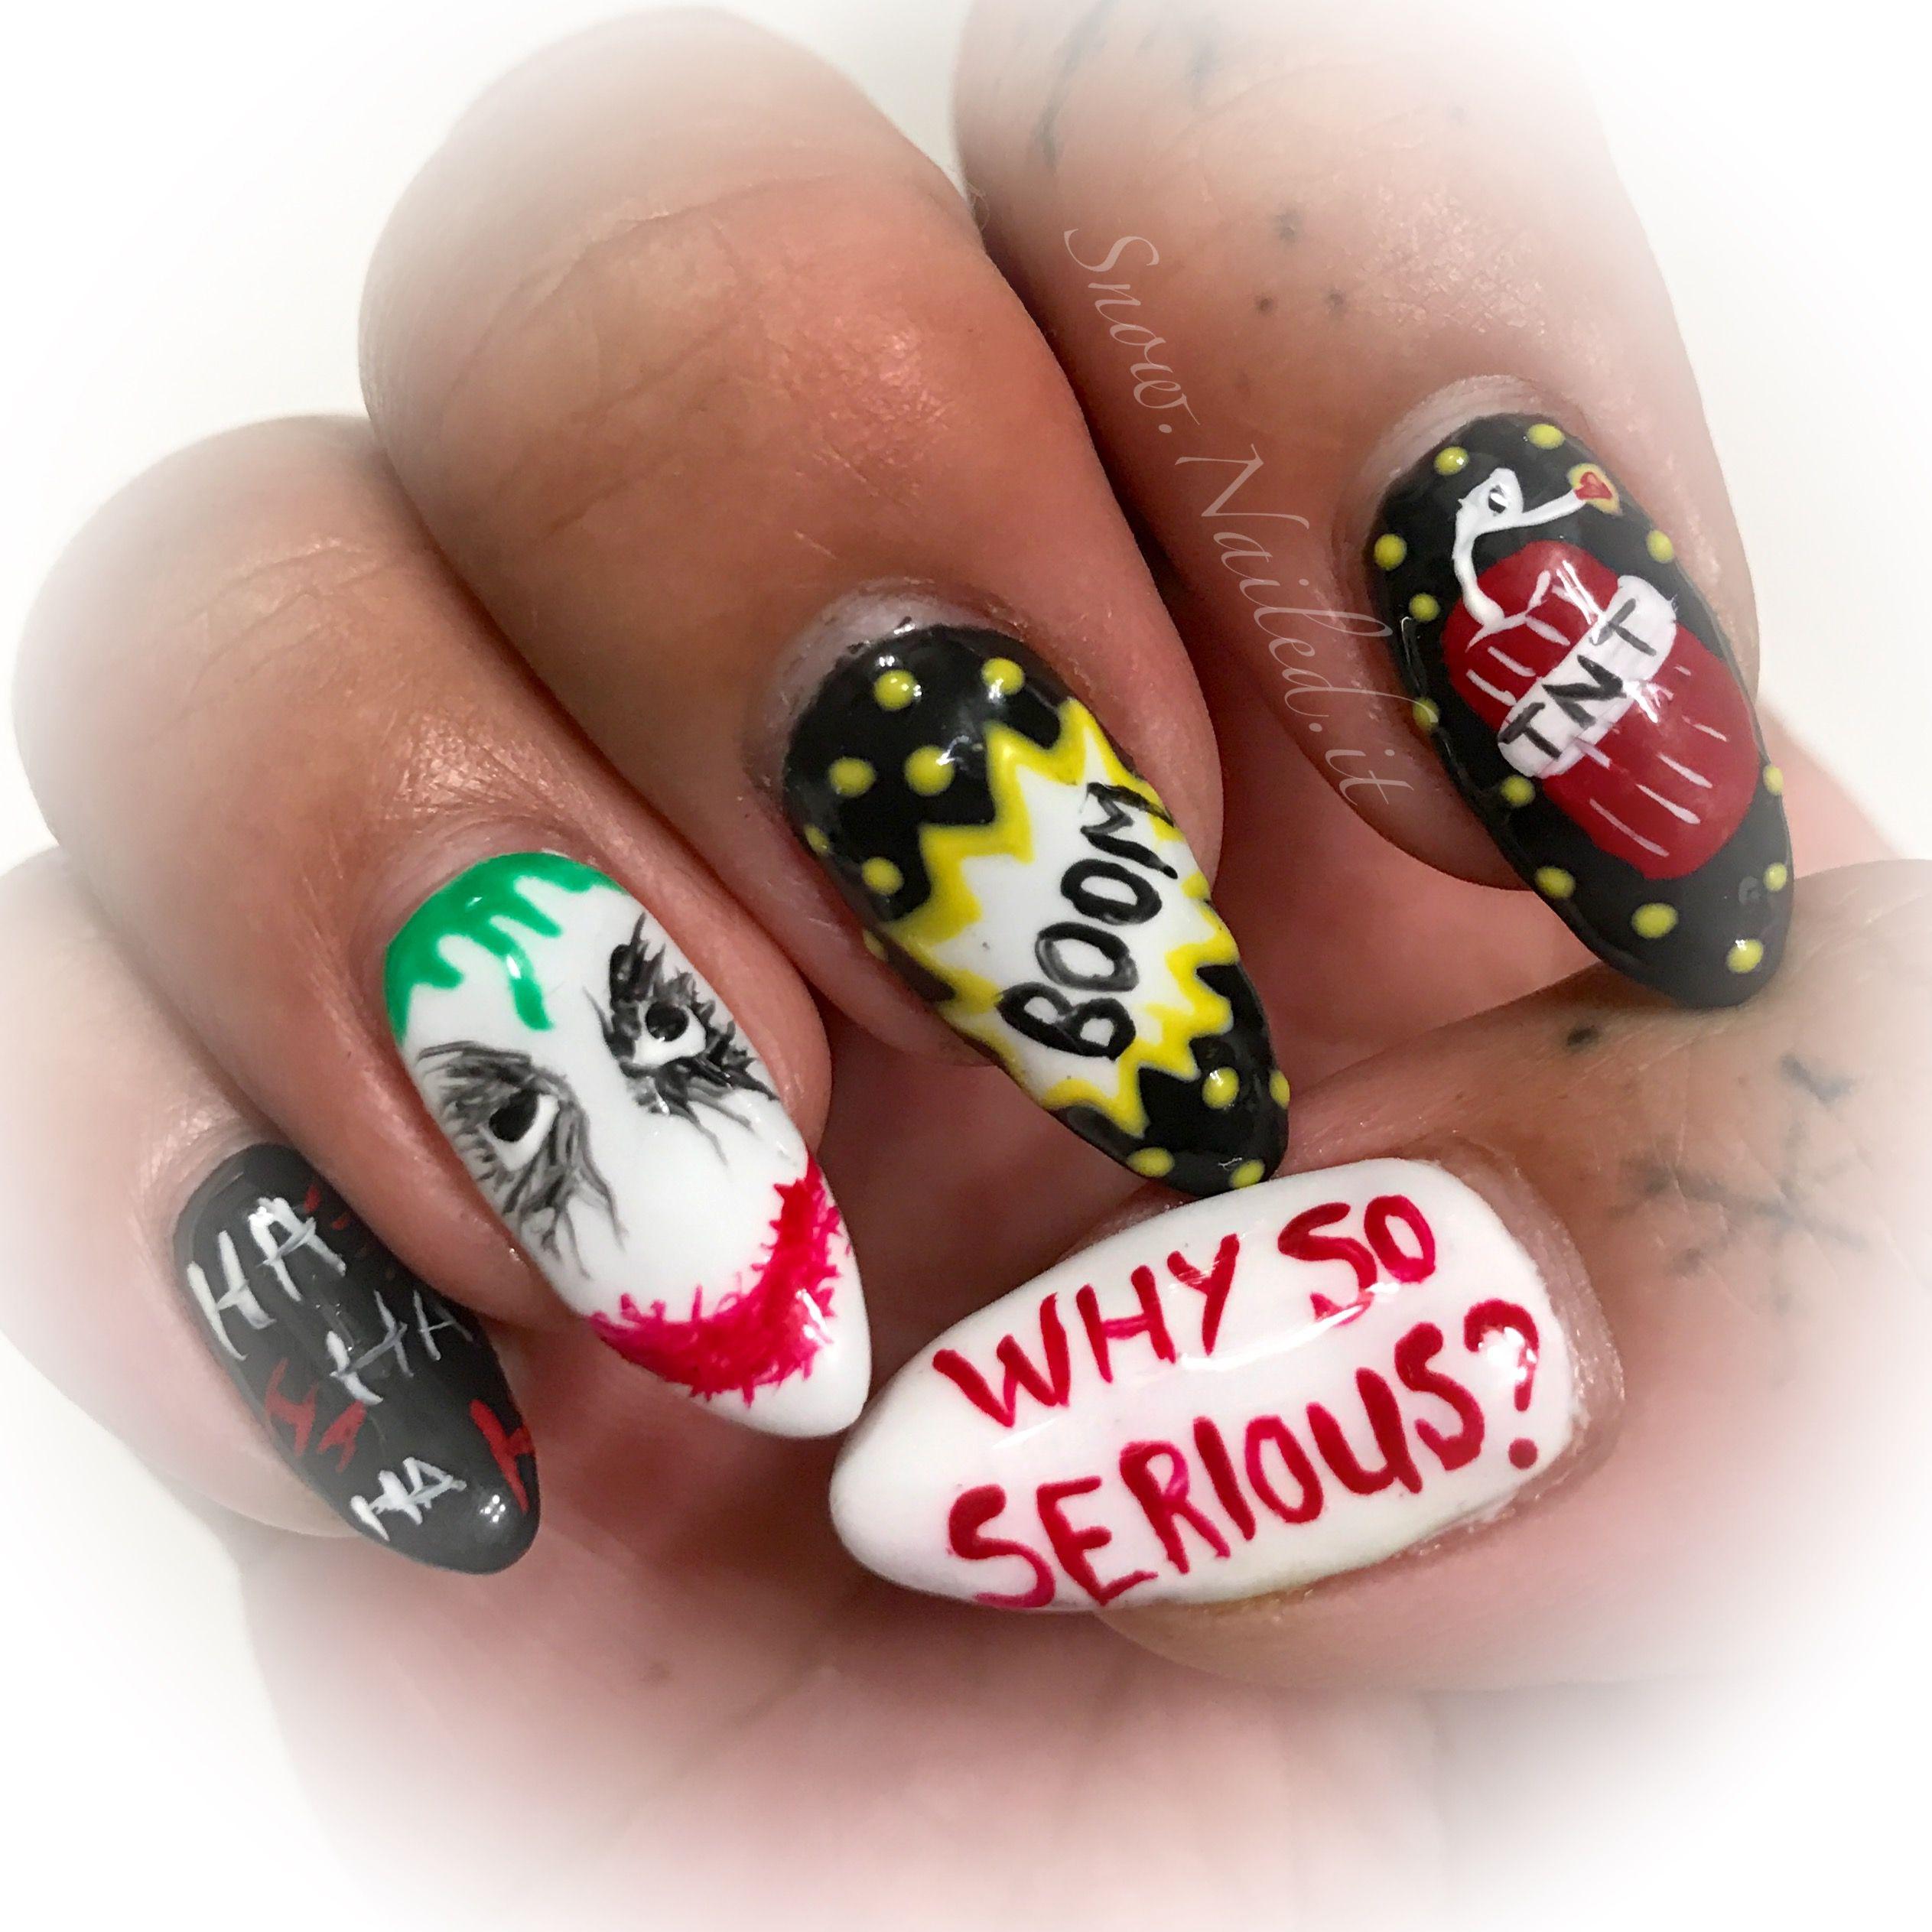 Joker nail art | Snow.Nailed.it | Pinterest | Snow nails